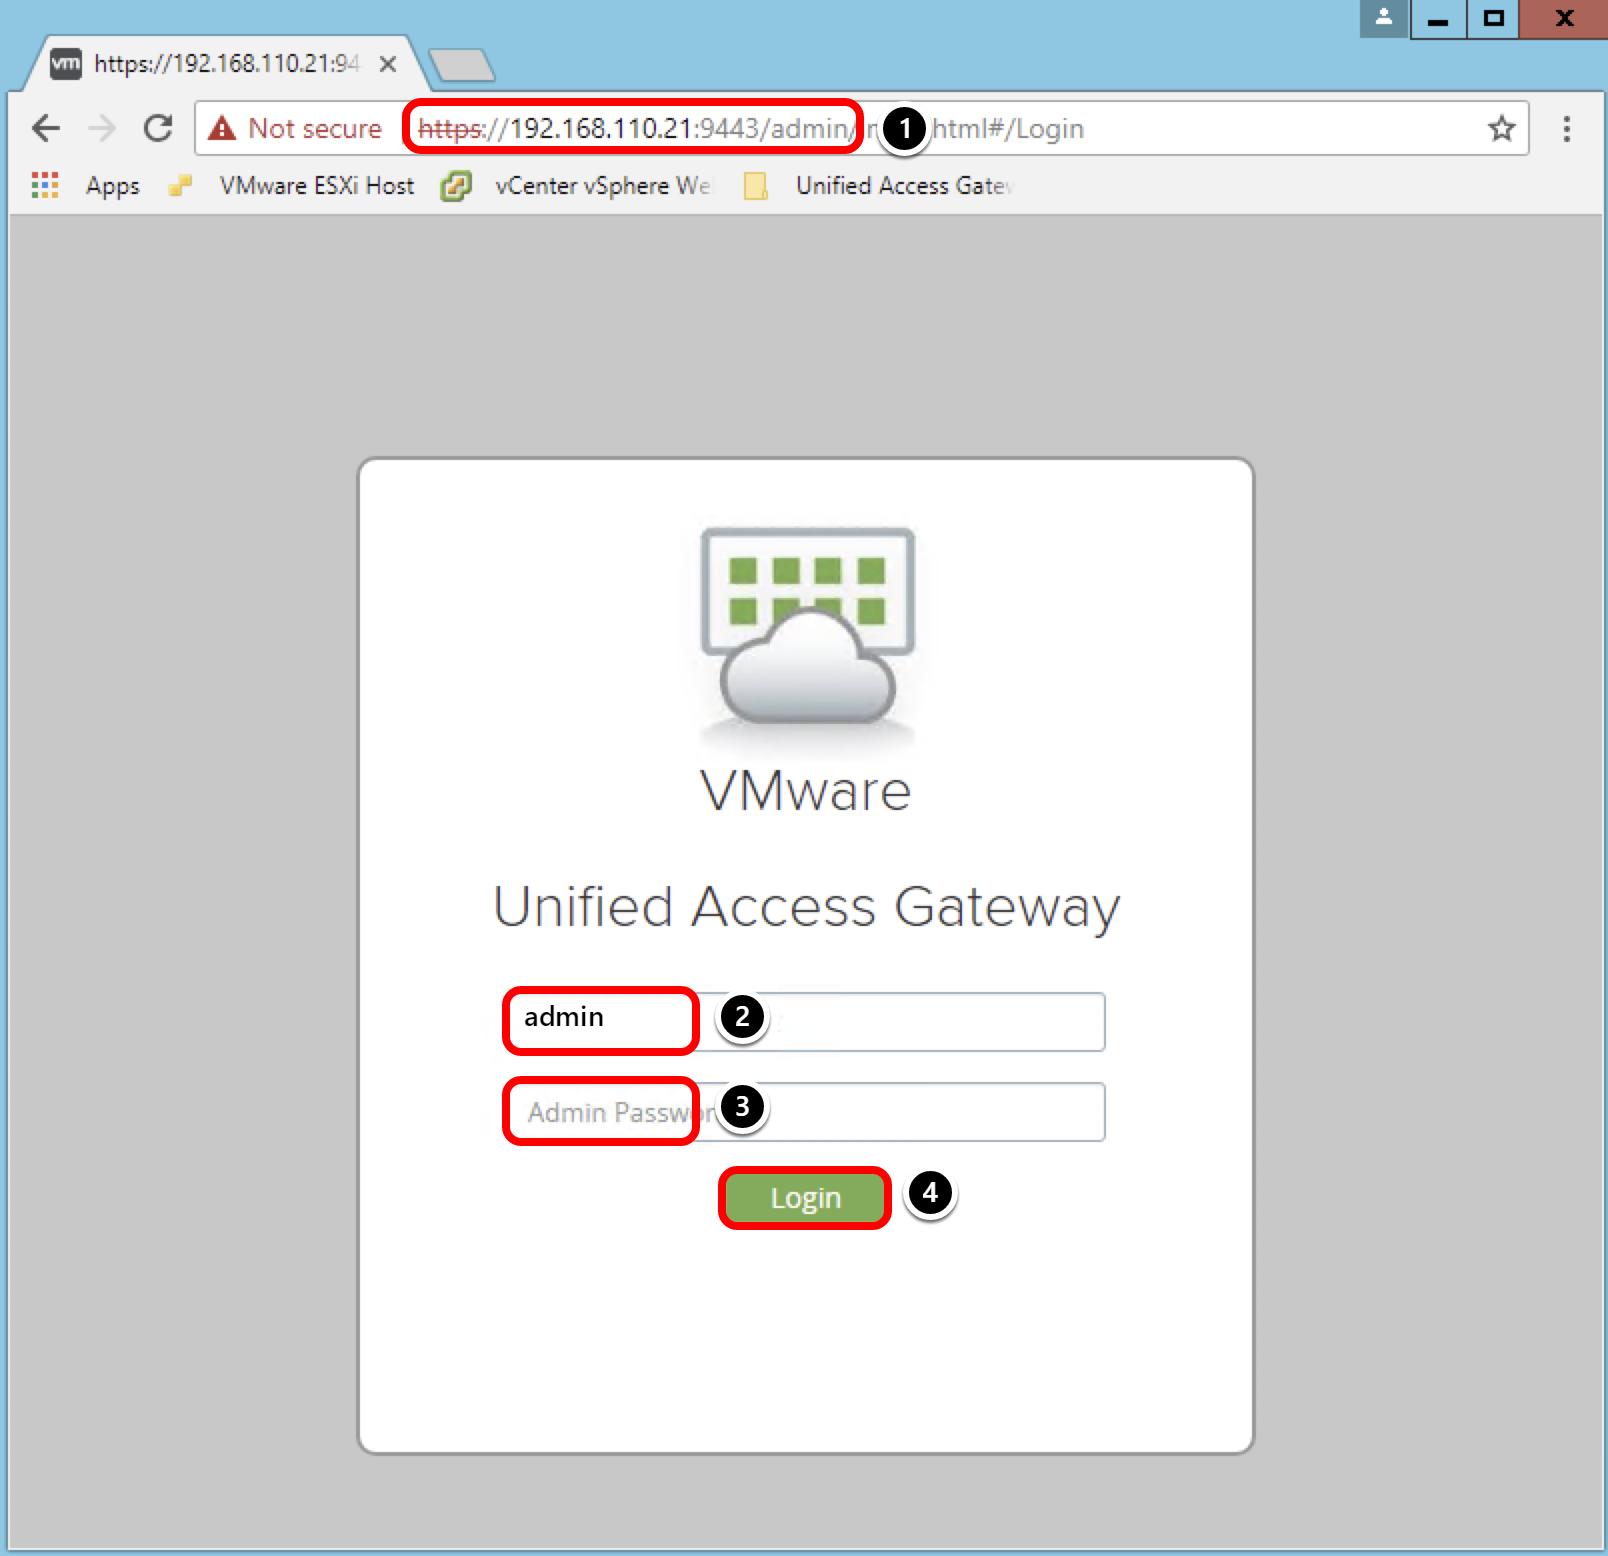 Acessing UAG Admin UI based on new IP address